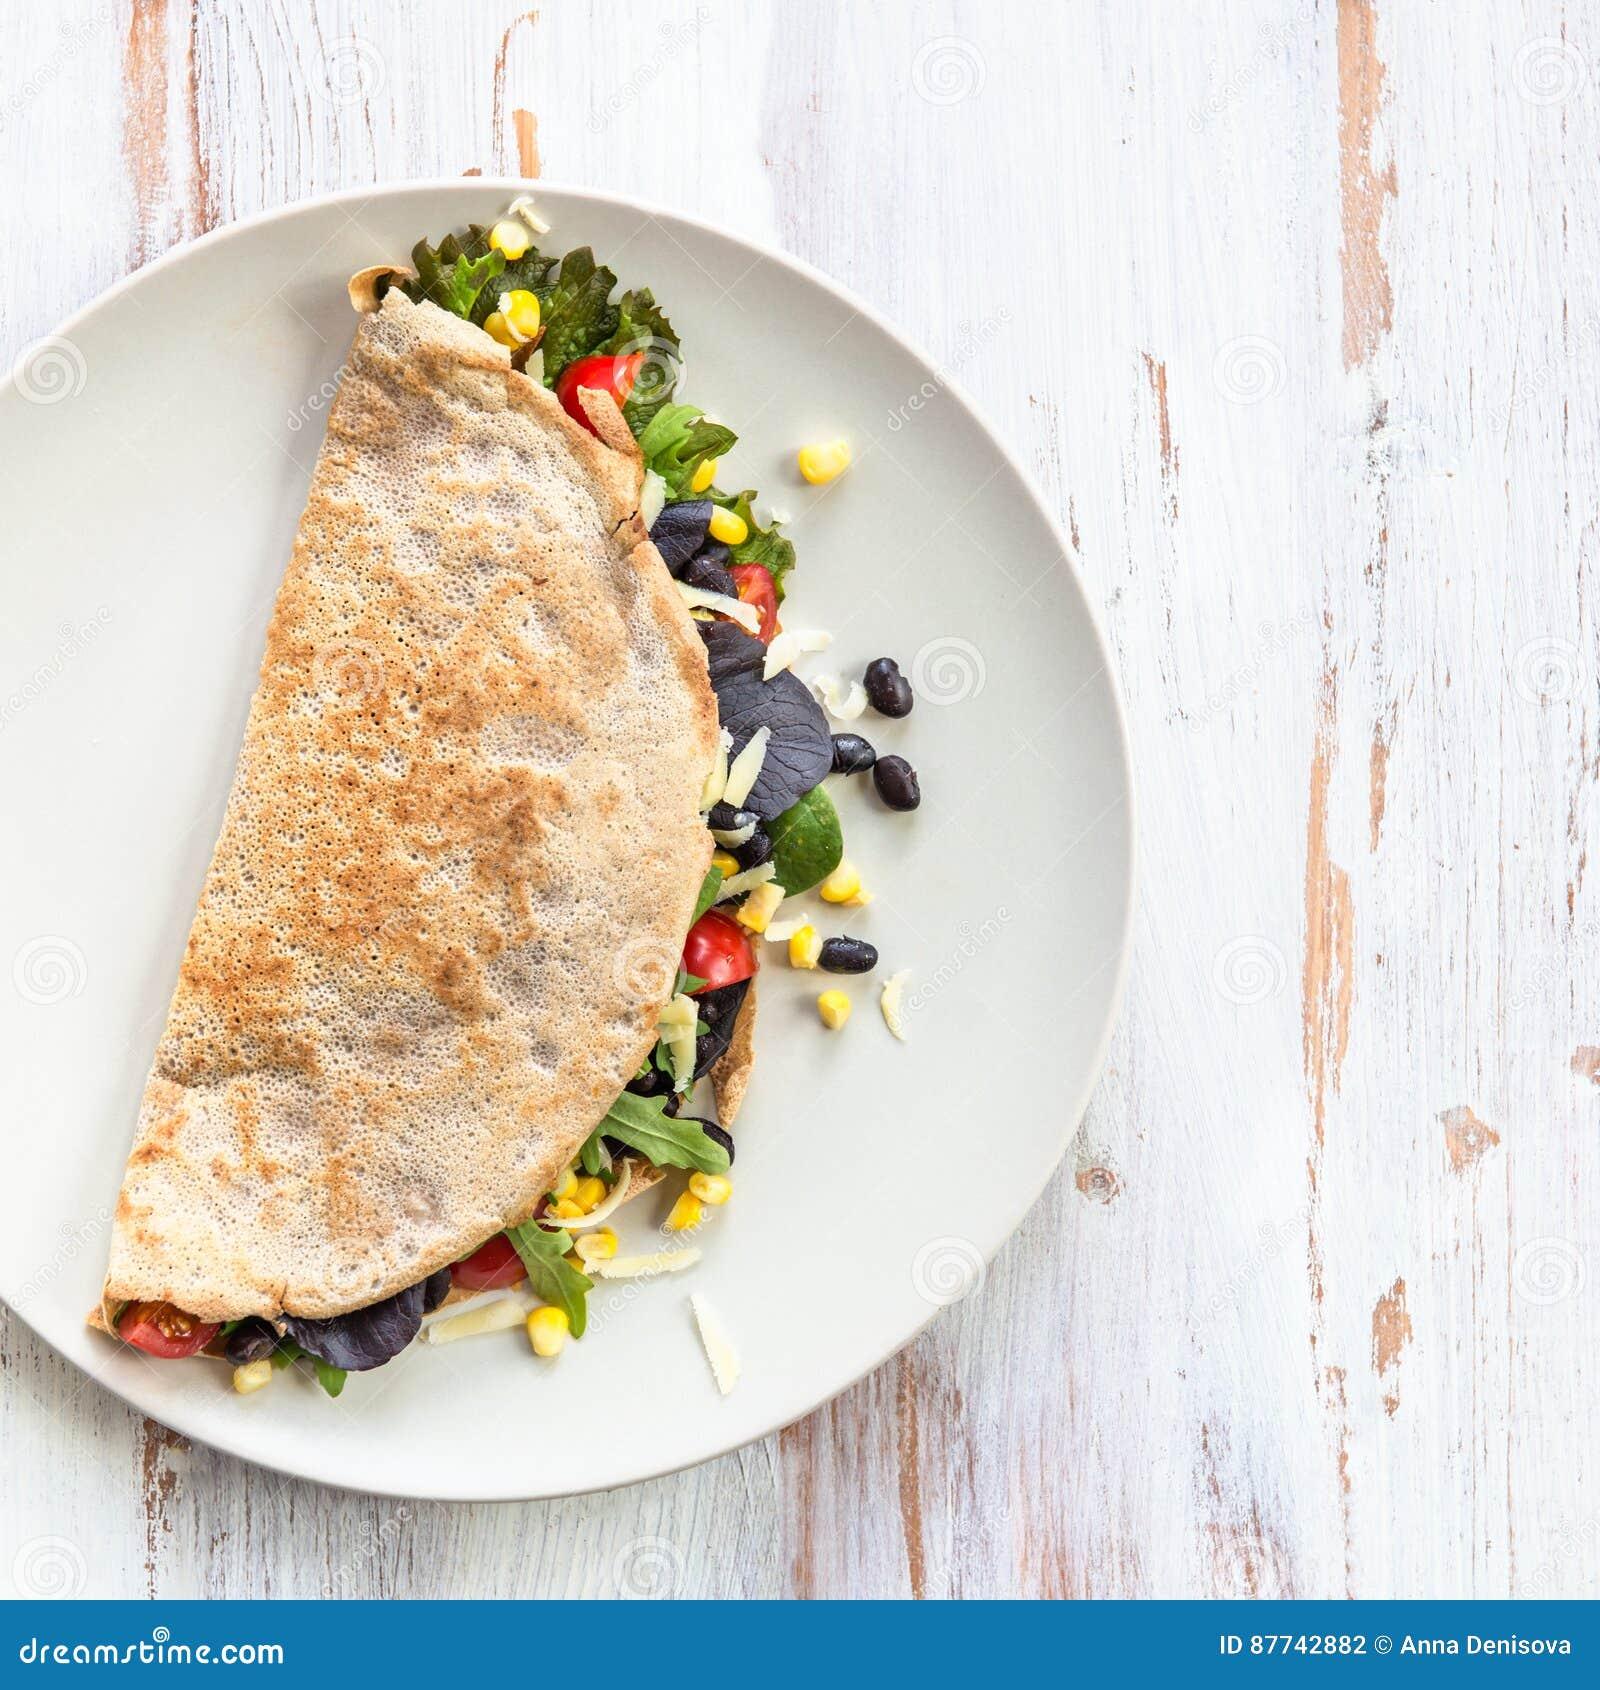 Savoury Buckwheat Pancake Or Quesadilla Stock Photo Image Of Black Cheese 87742882